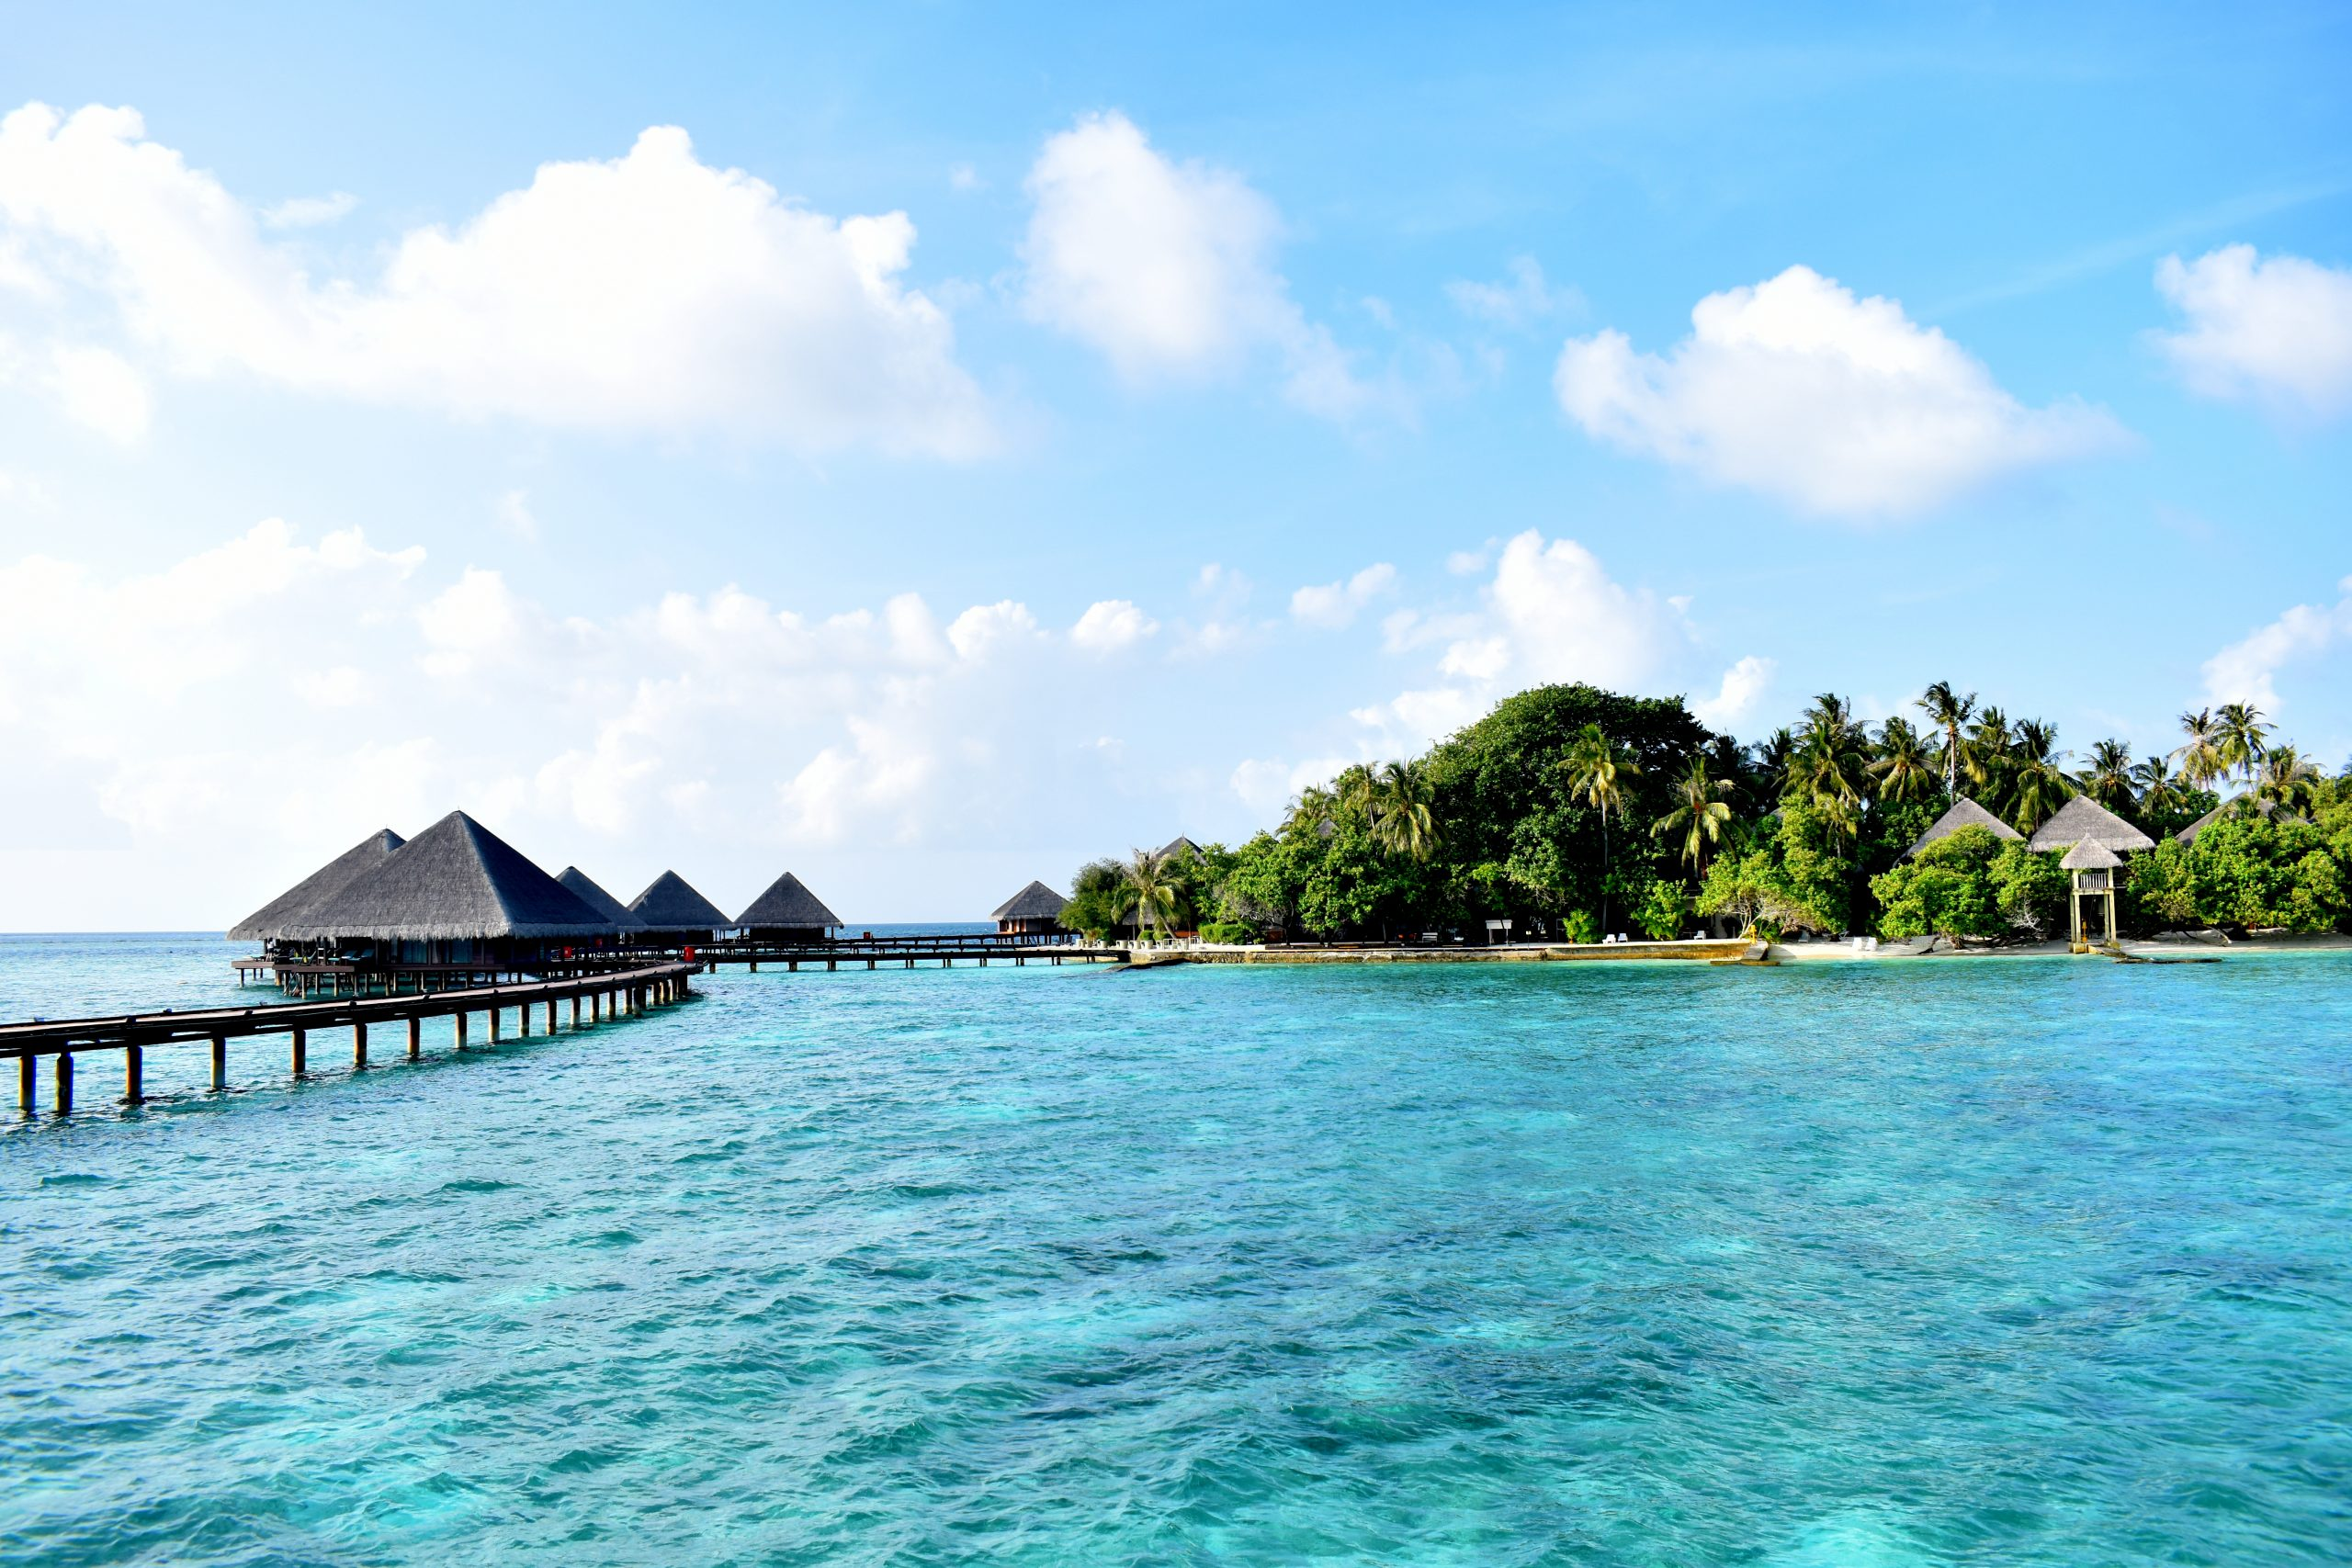 Adaaran Club Rannalhi resort in Maldives